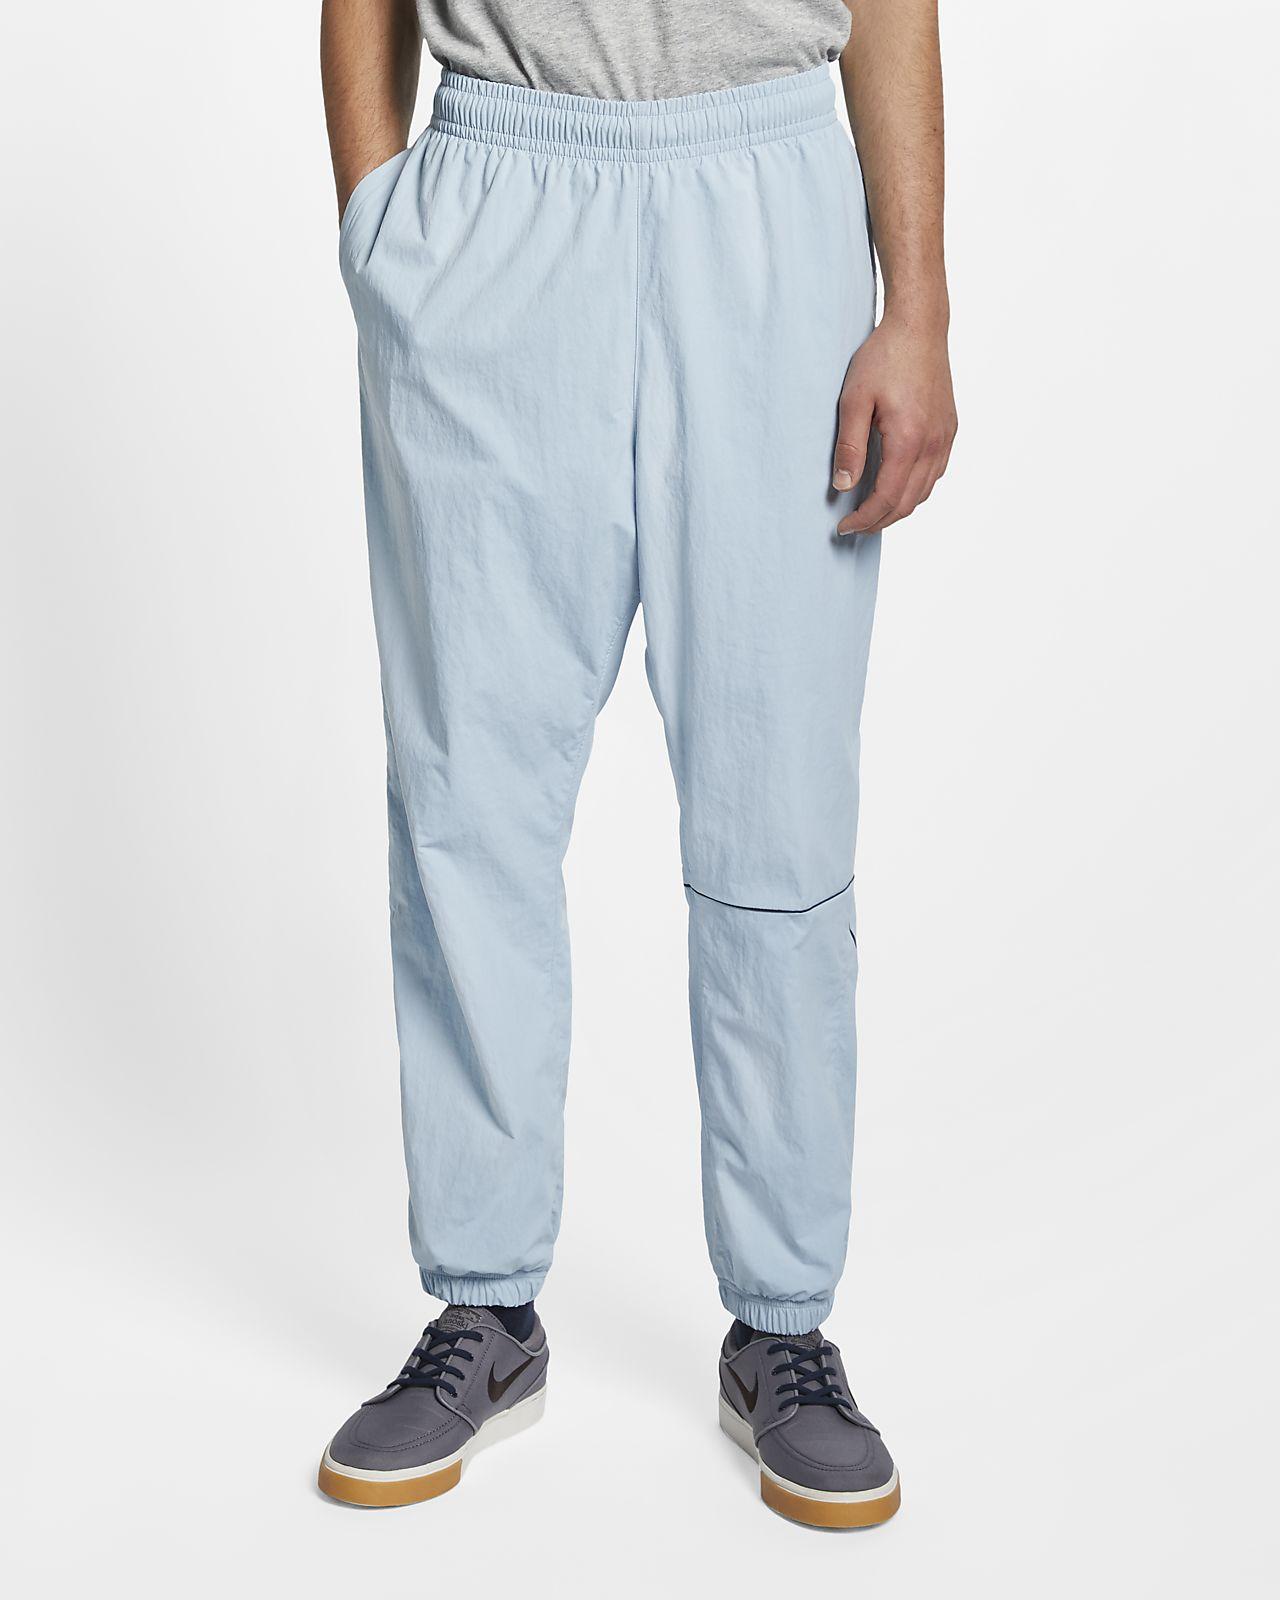 c3b9003ac0 Pantalon de survêtement pour le skateboard avec Swoosh Nike SB